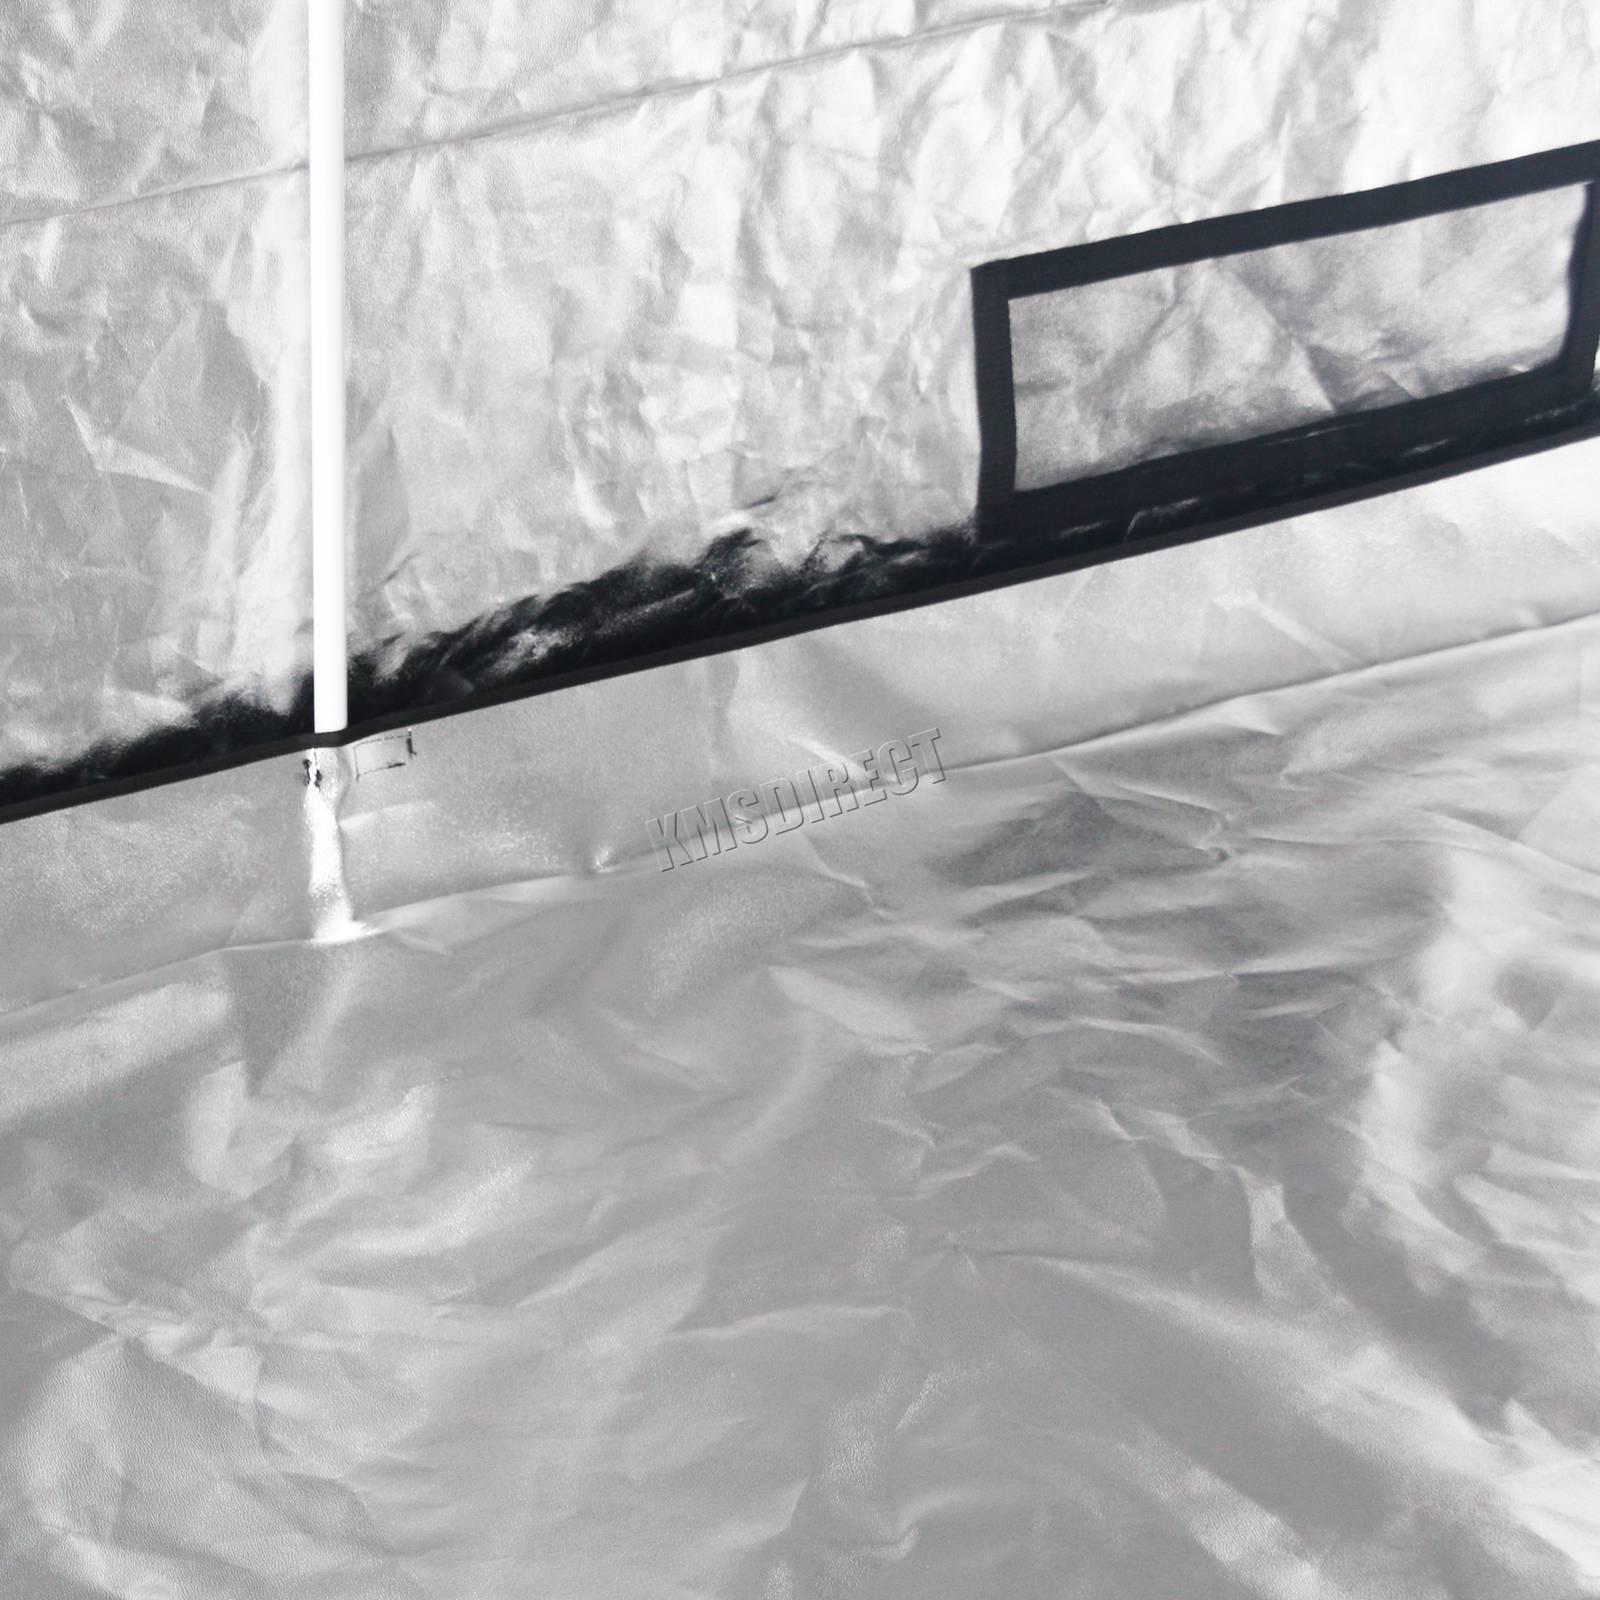 Indoor-Portable-Grow-Tent-Box-Silver-Mylar-Hydroponics-Bud-Green-Room-New-Design miniatuur 29